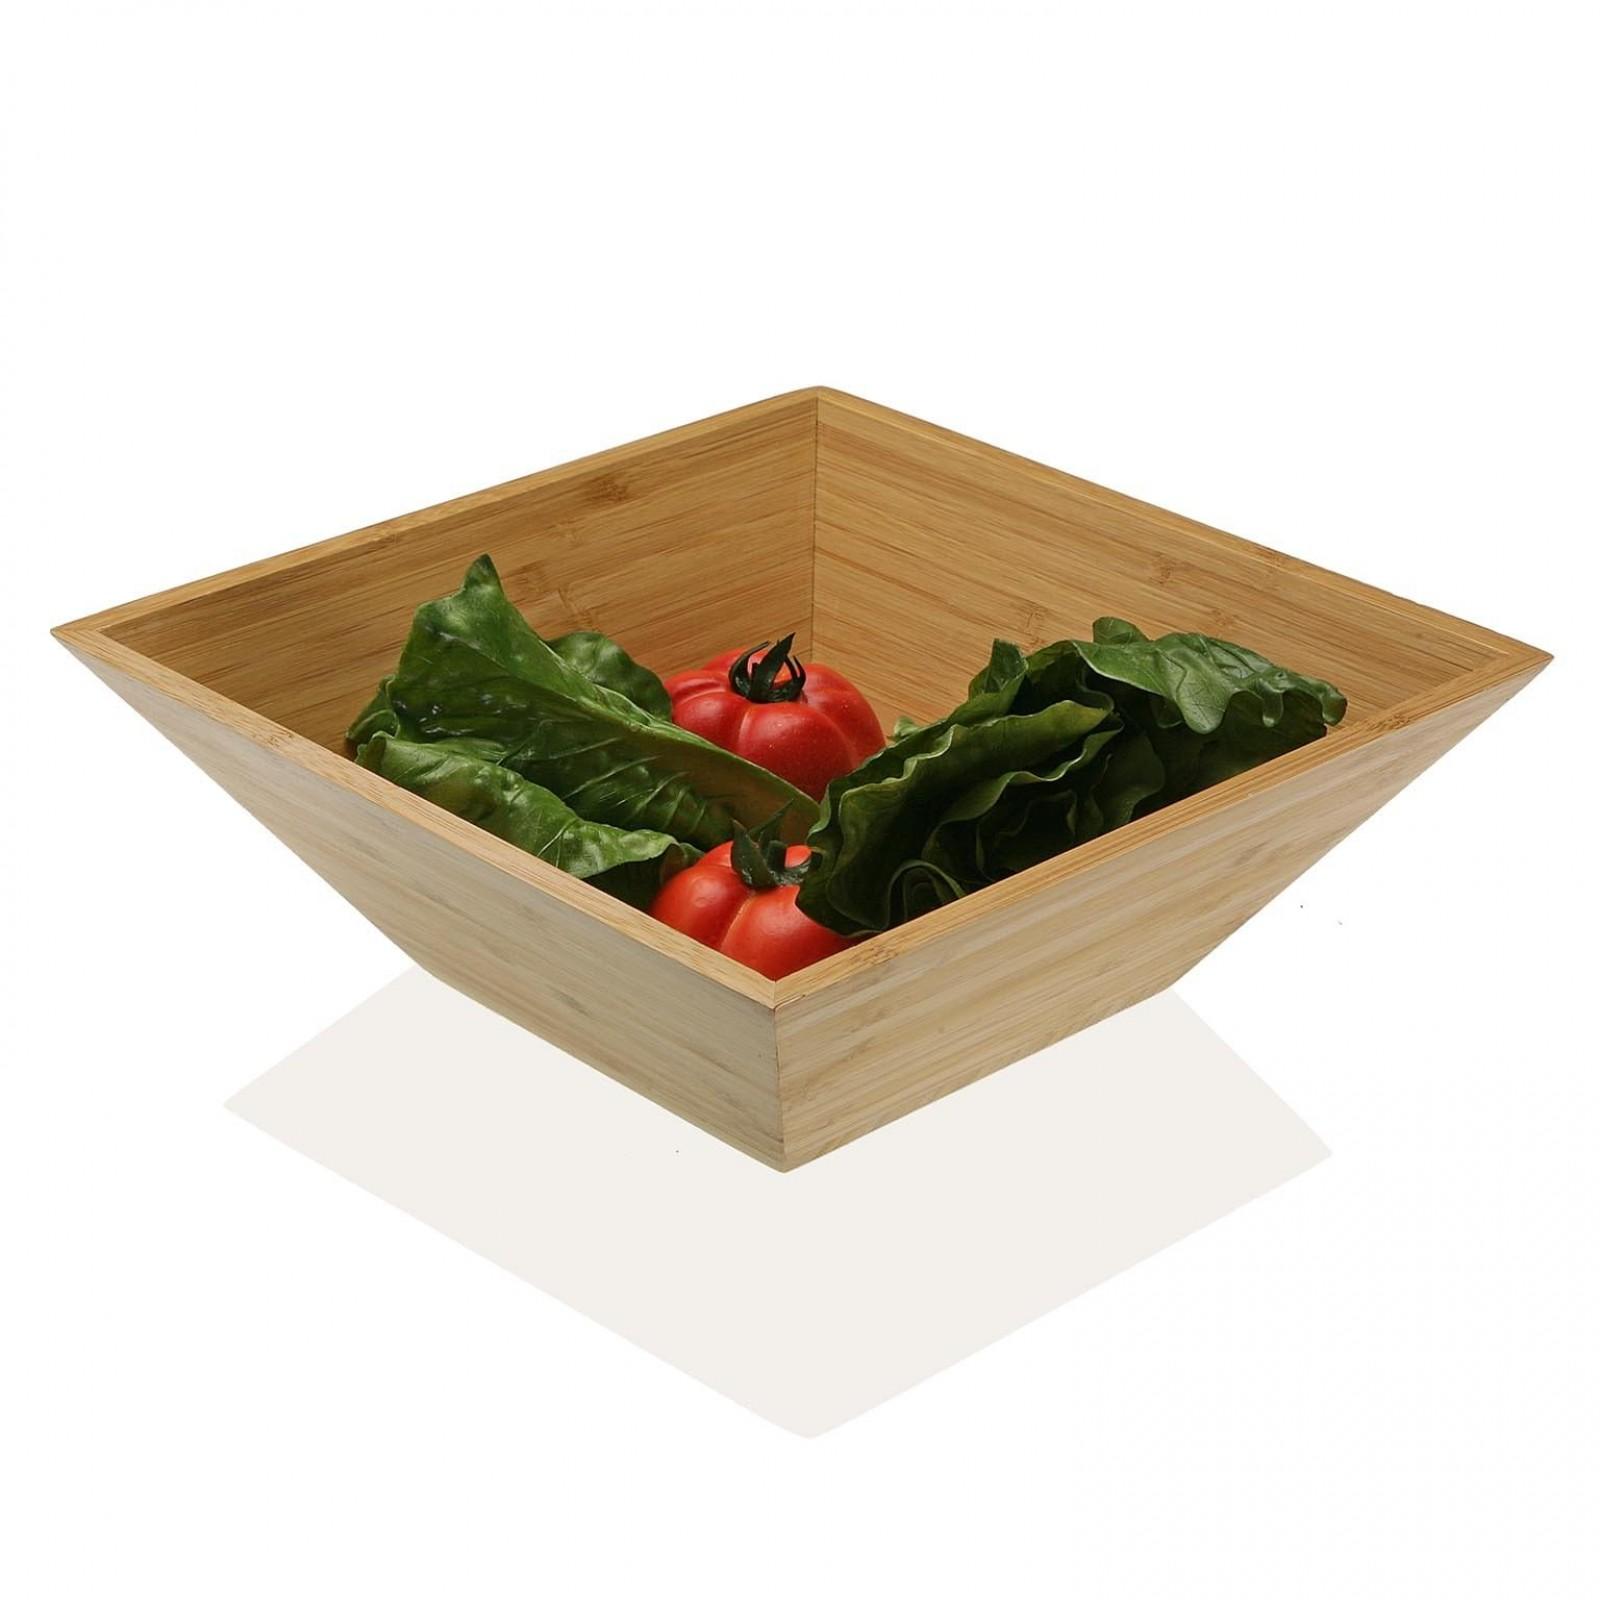 Wooden Salad / Fruit Bowl (Bamboo) - Versa